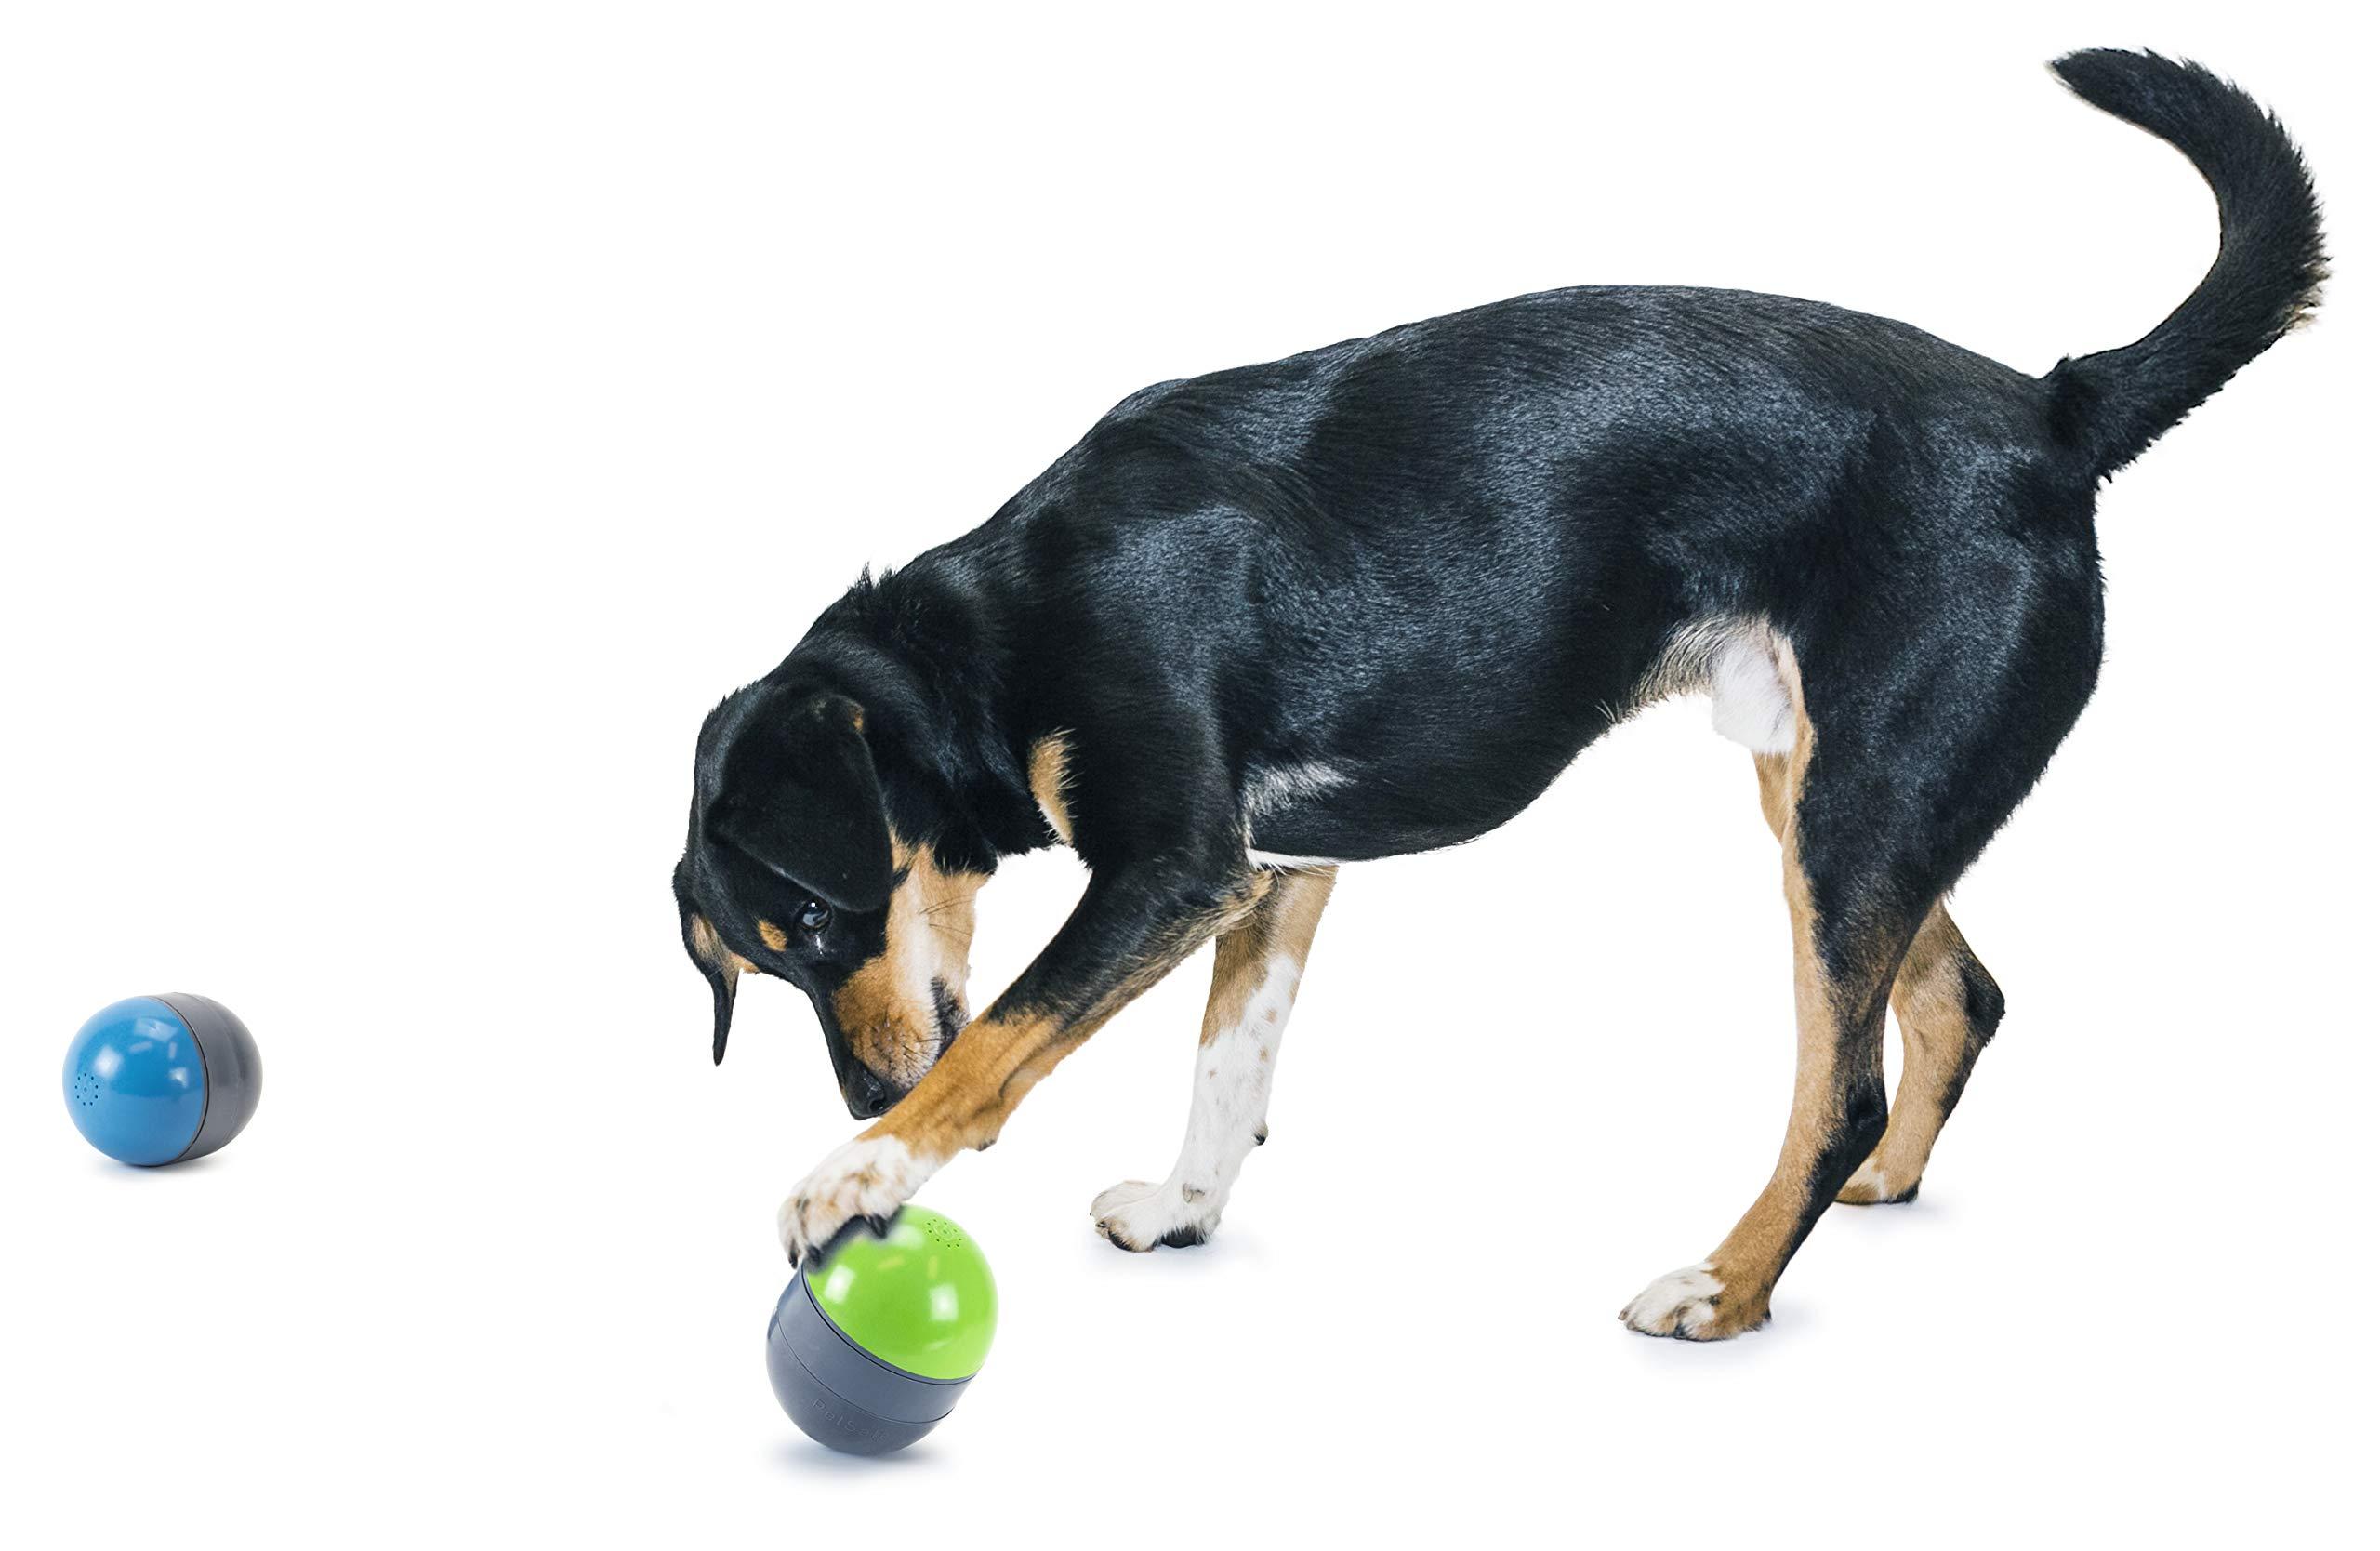 PetSafe Ricochet Electronic Dog Toys, Interactive Sound Game for Pets by PetSafe